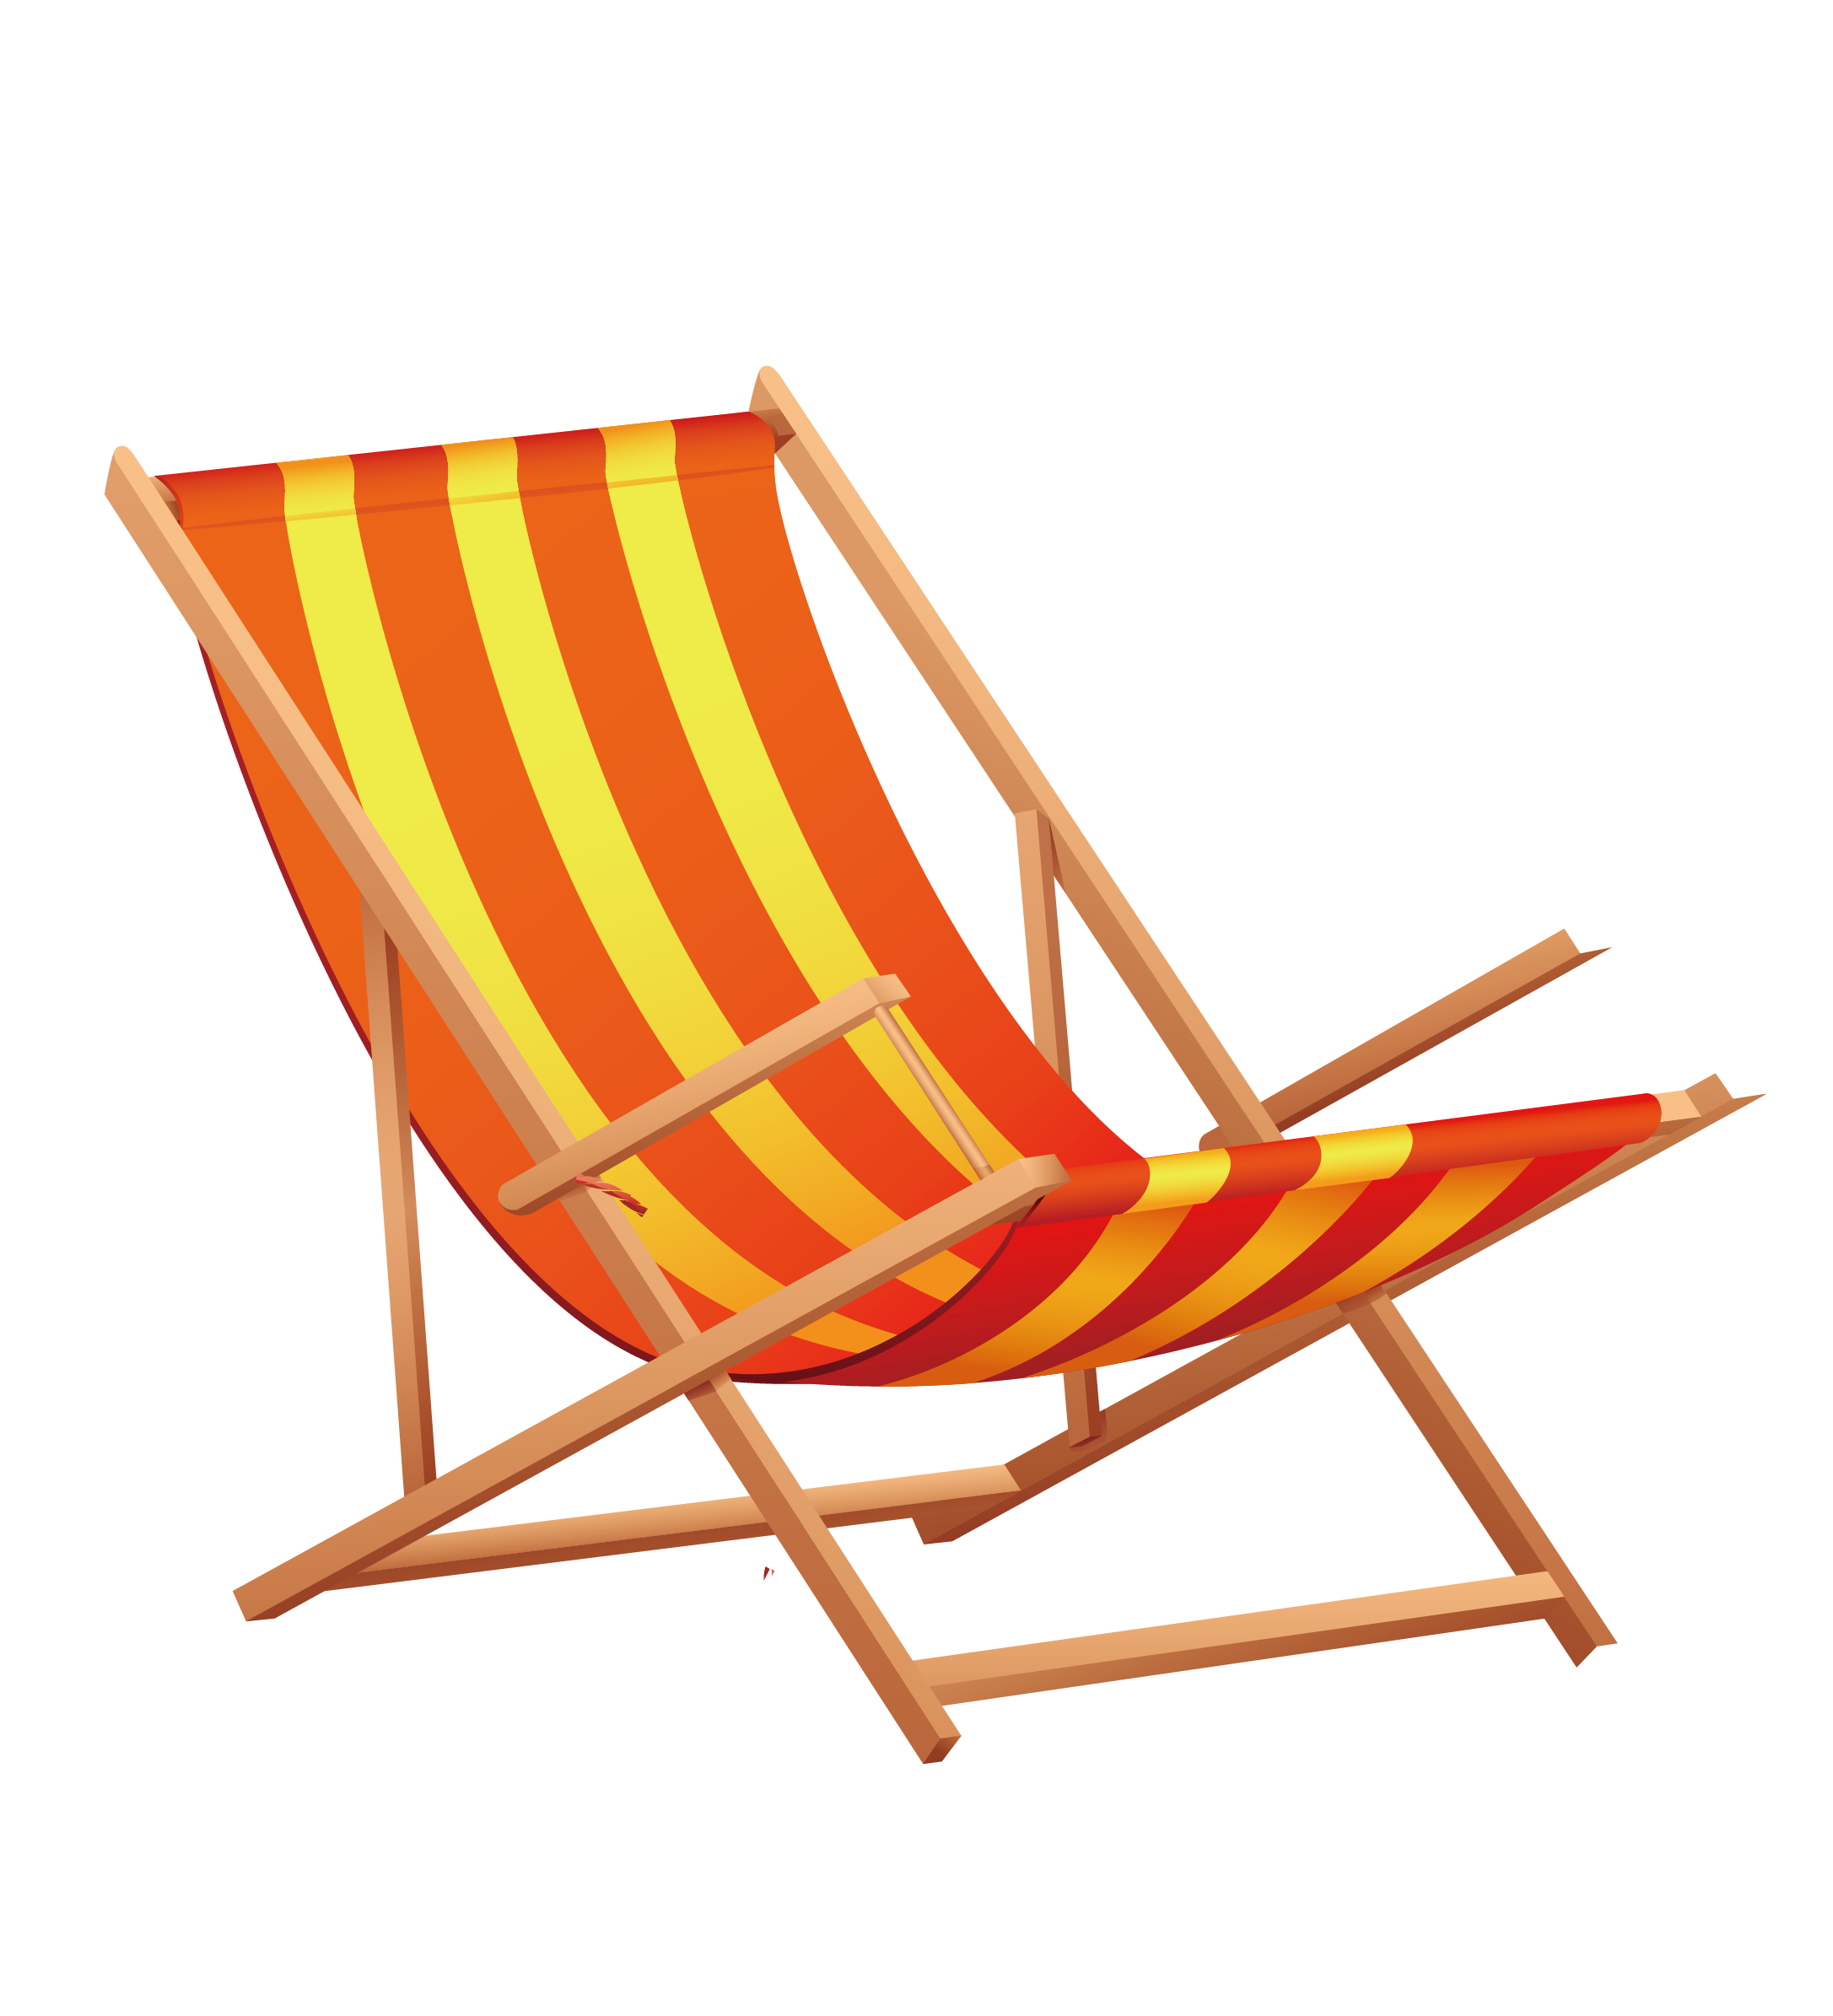 Clipart chair garden chair. Umbrella beach clip art